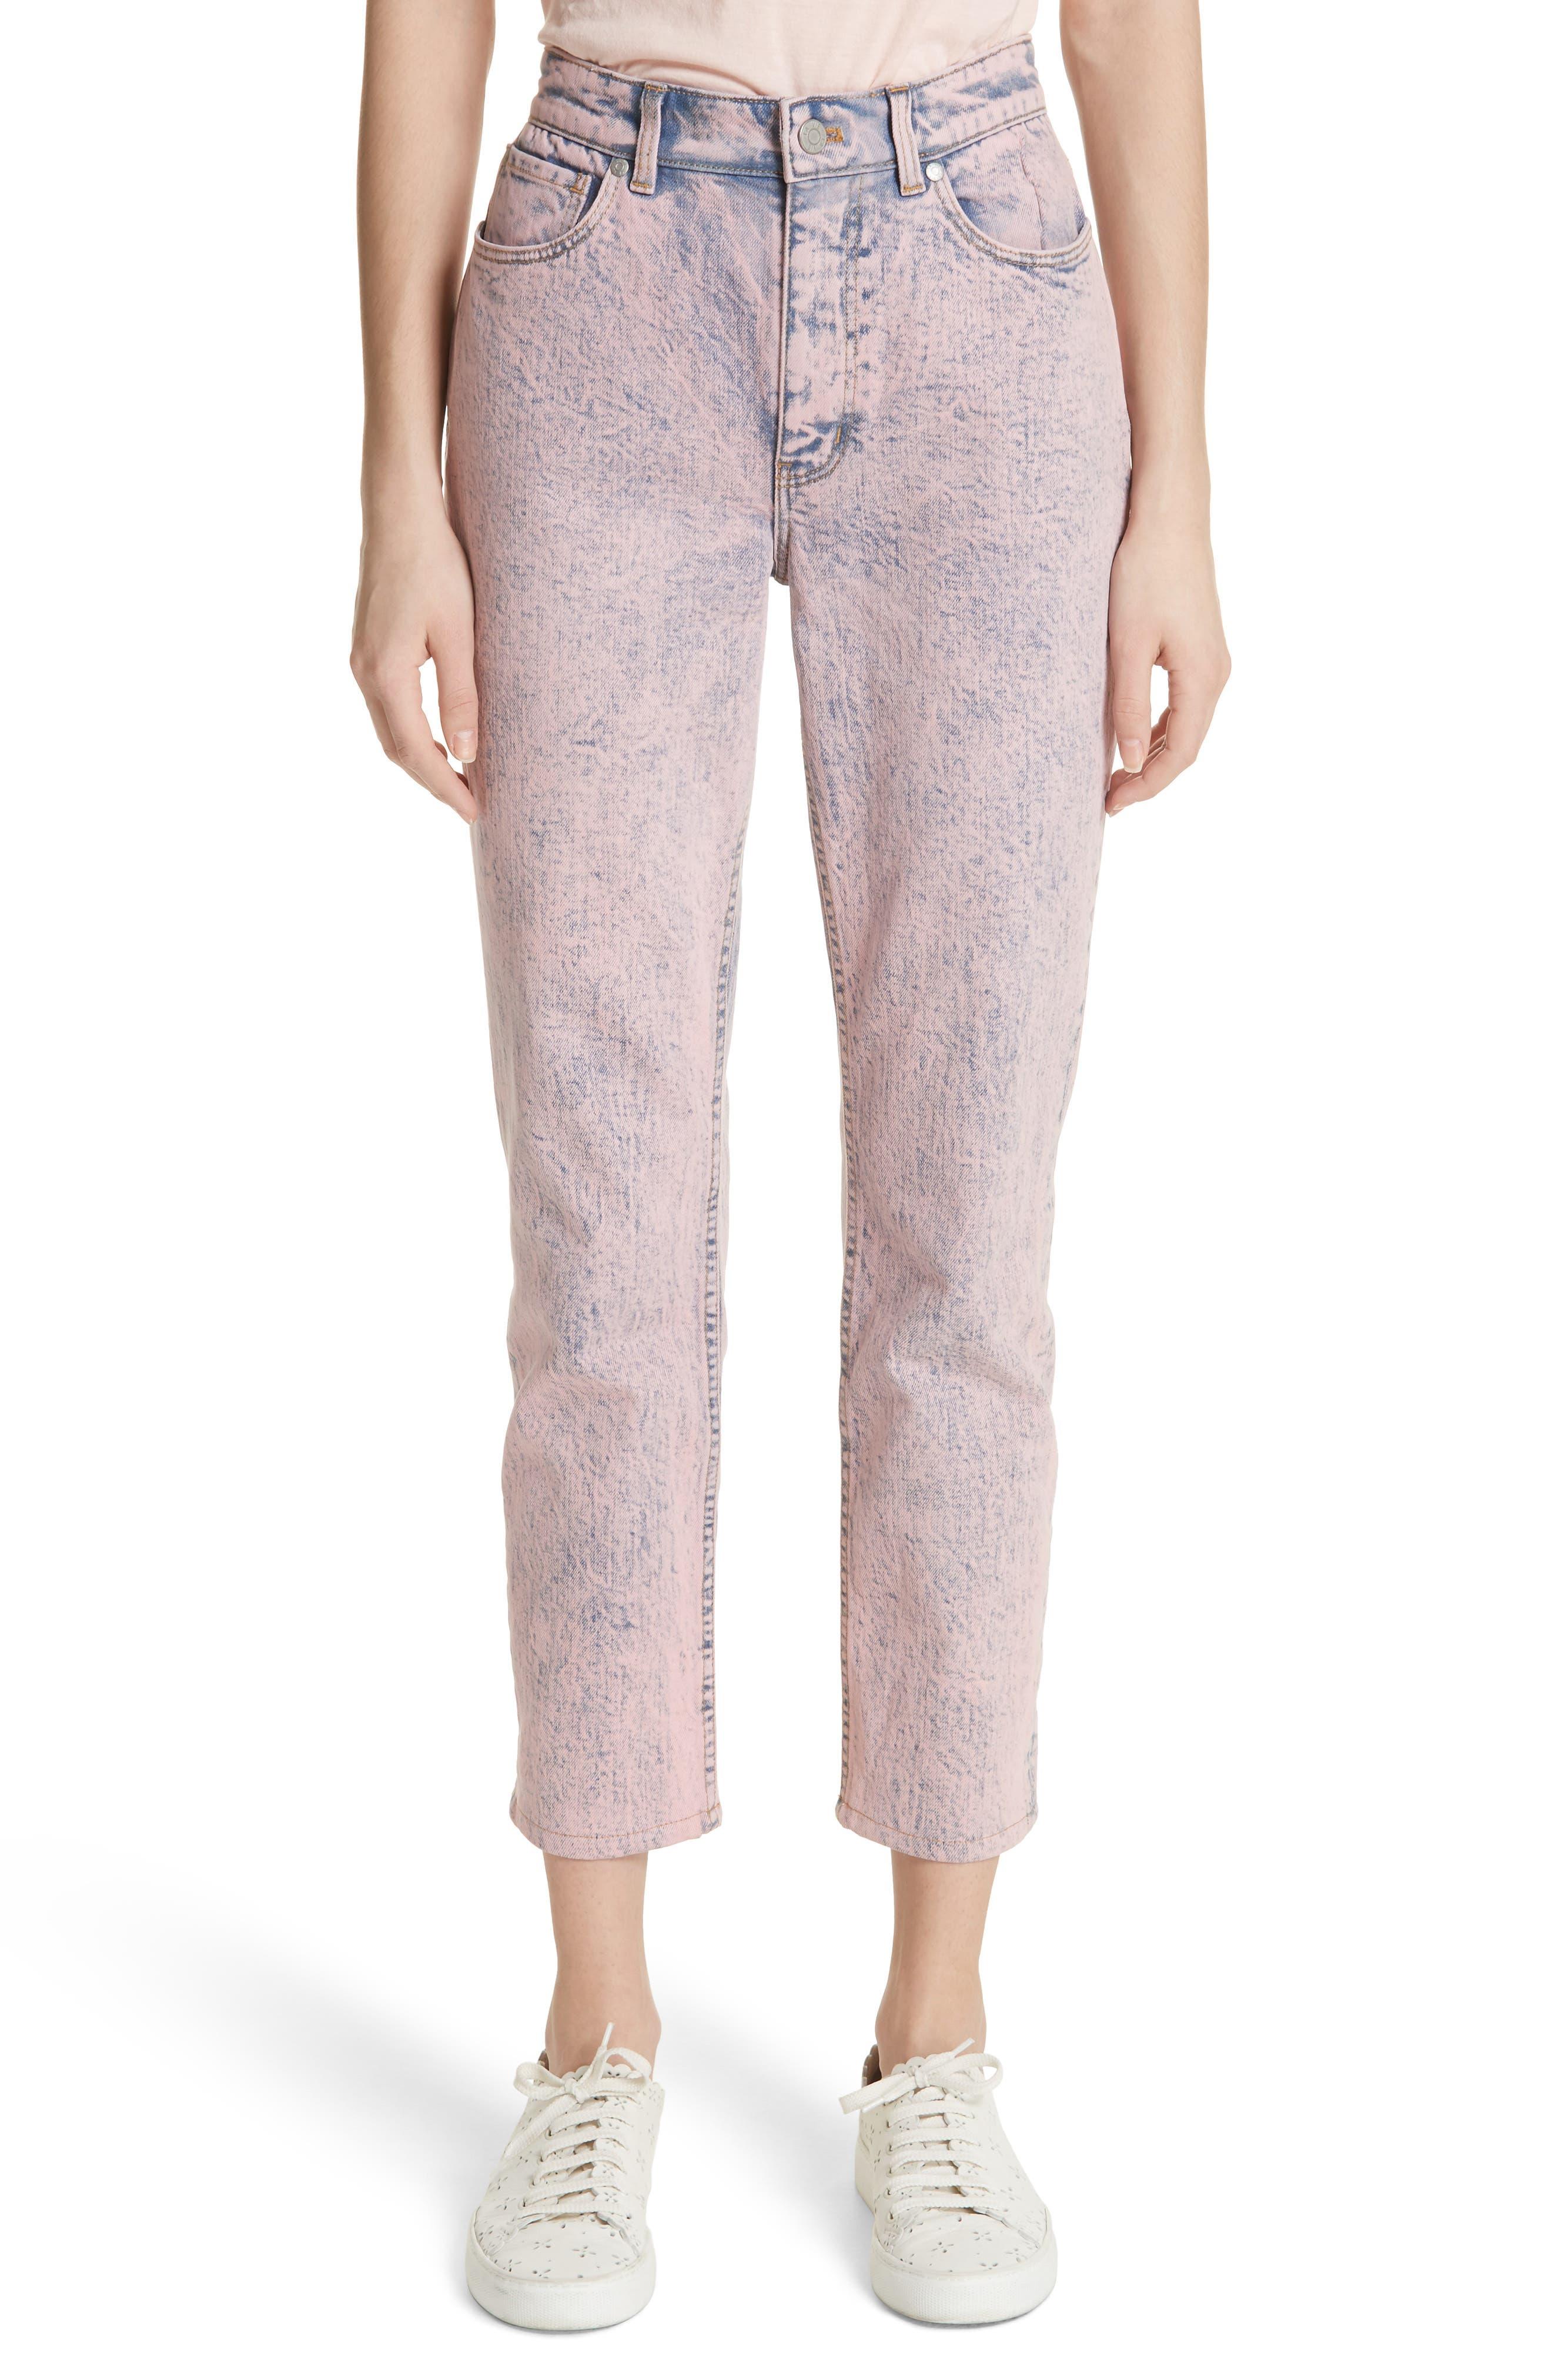 Main Image - La Vie Rebecca Taylor Ines Acid Wash Crop Jeans